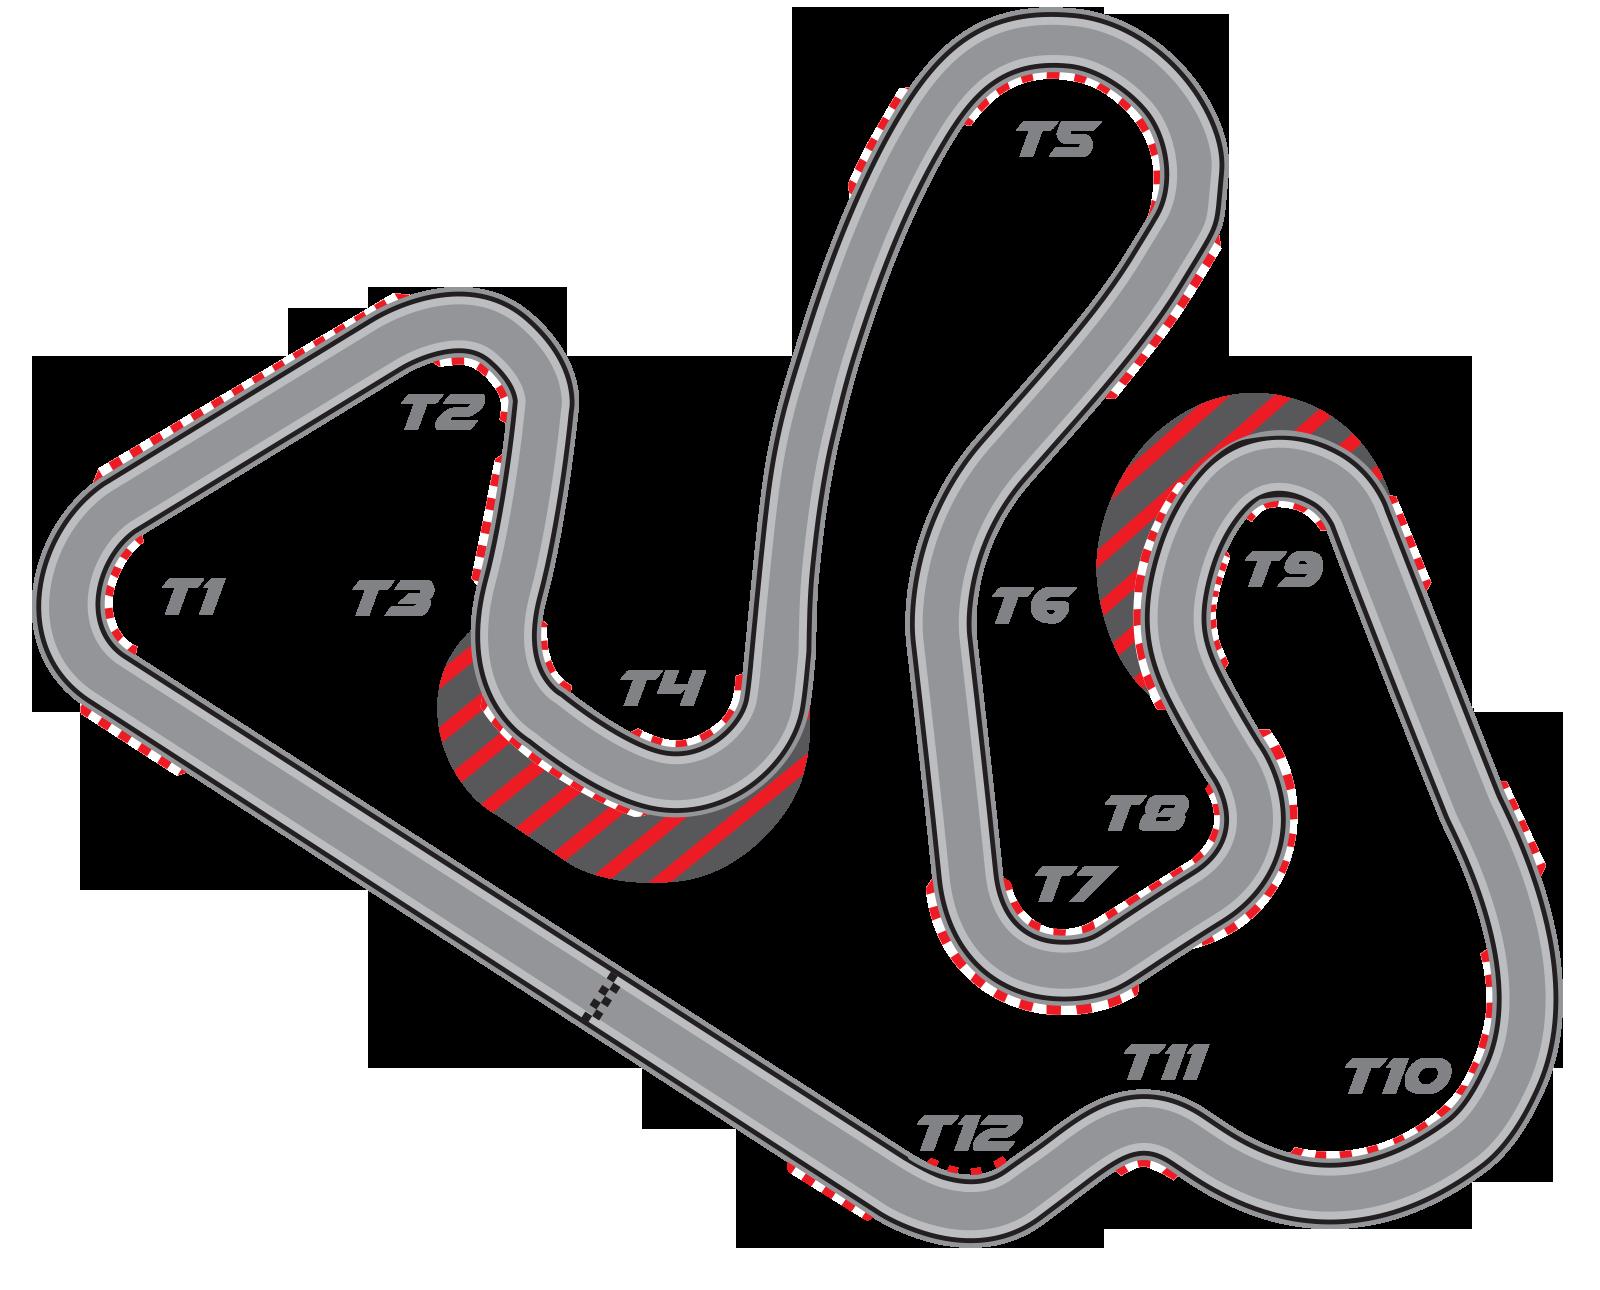 Go Kart Racing Houston >> Go-Kart Track Maps for Speedsportz Racing Park - Serving ...